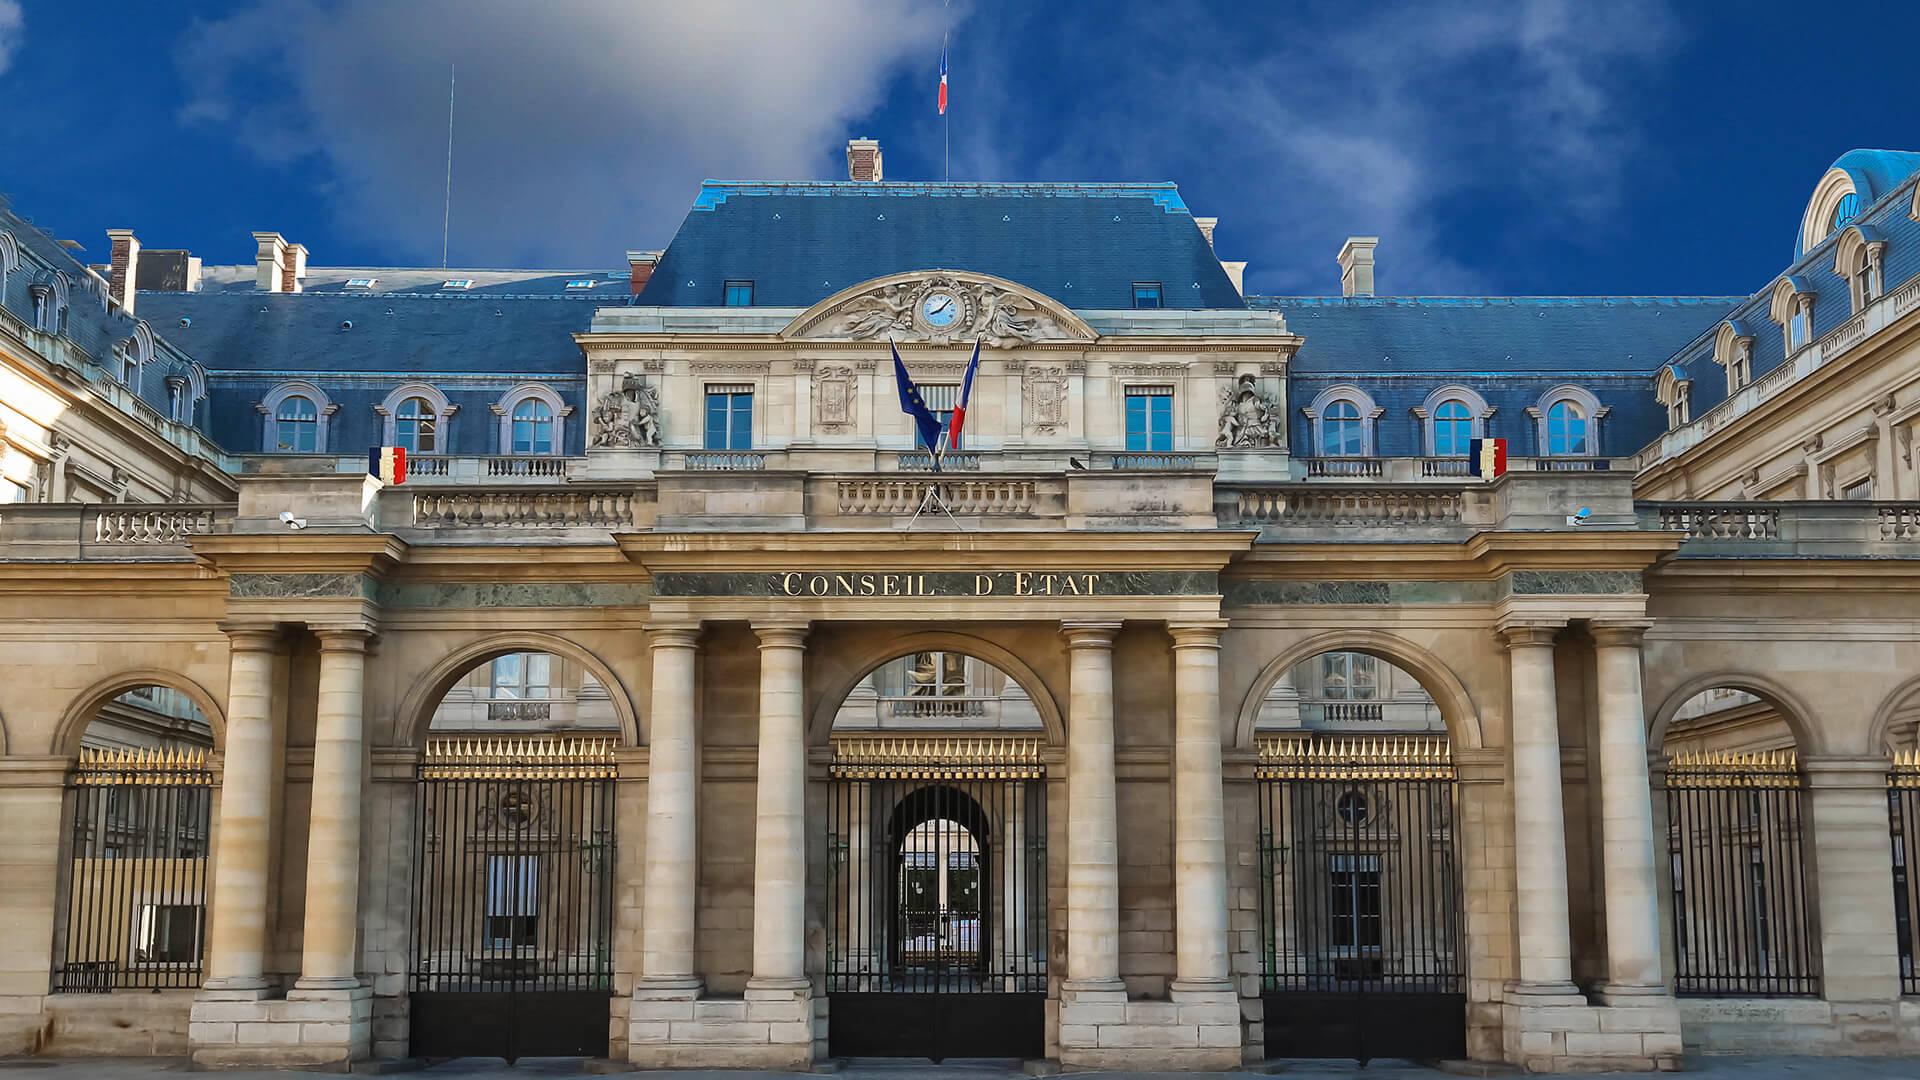 Palais-Royal feature